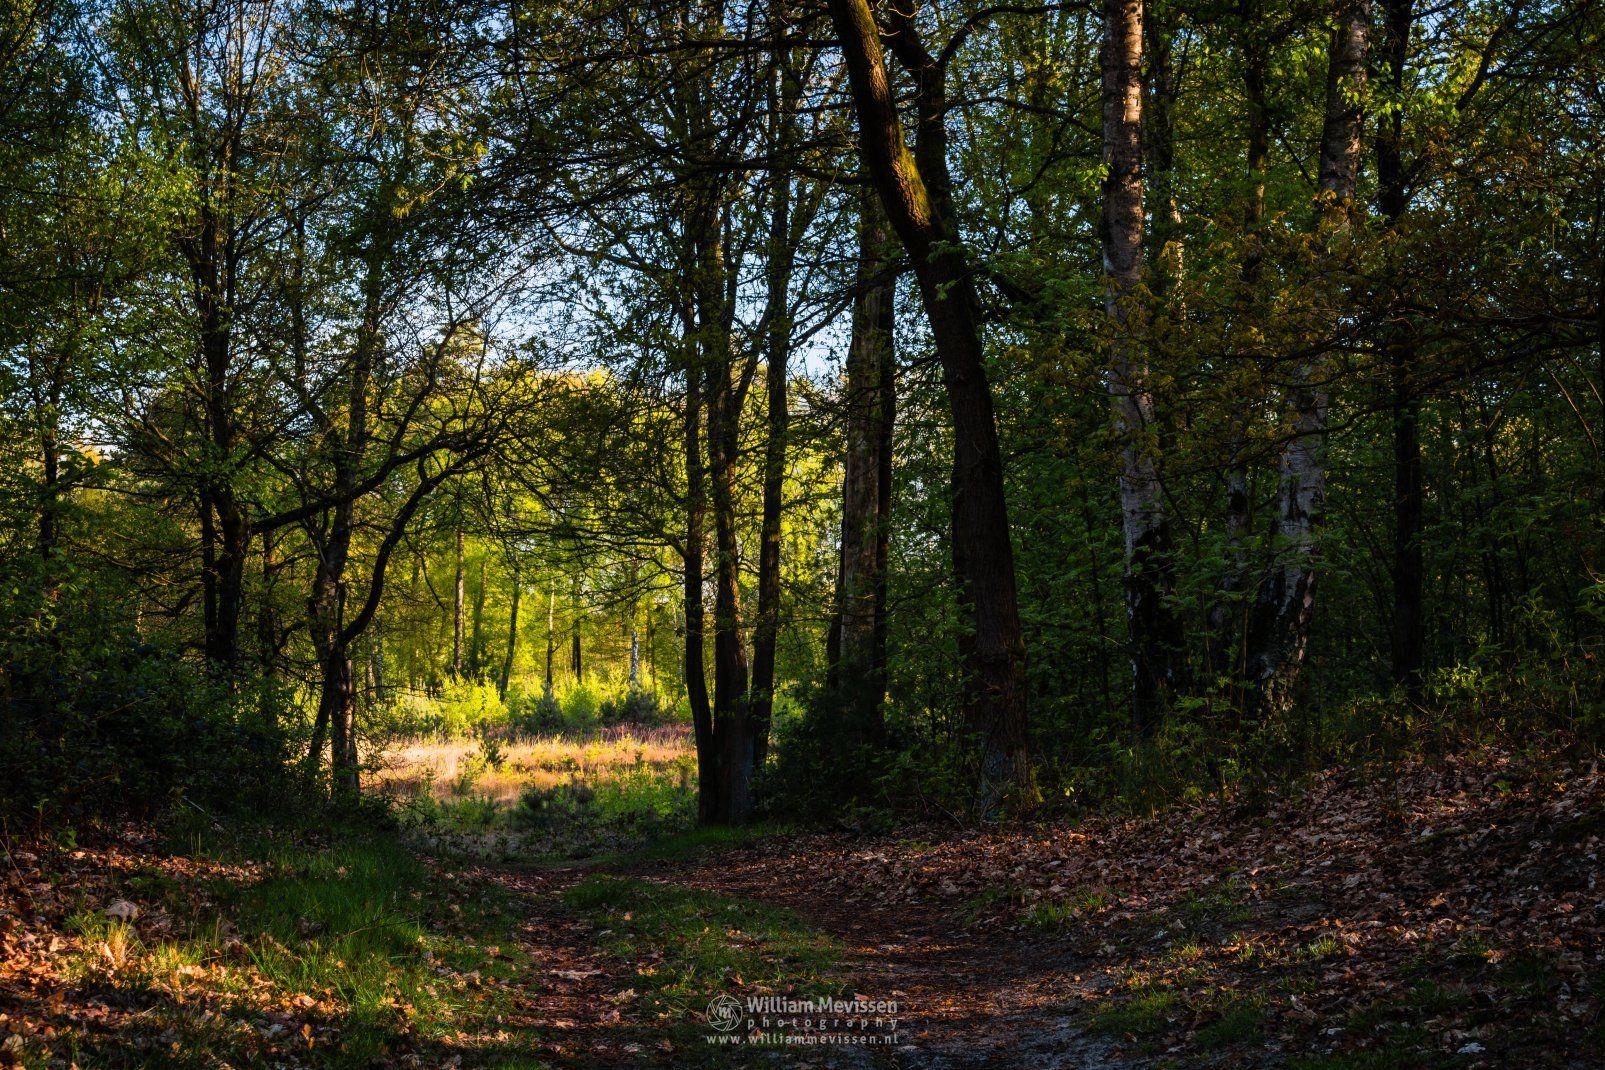 Photo Forest Path Into The Light in nature reserve Ravenvennen by William Mevissen. Landscape and Nature Photography at www.williammevissen.nl.